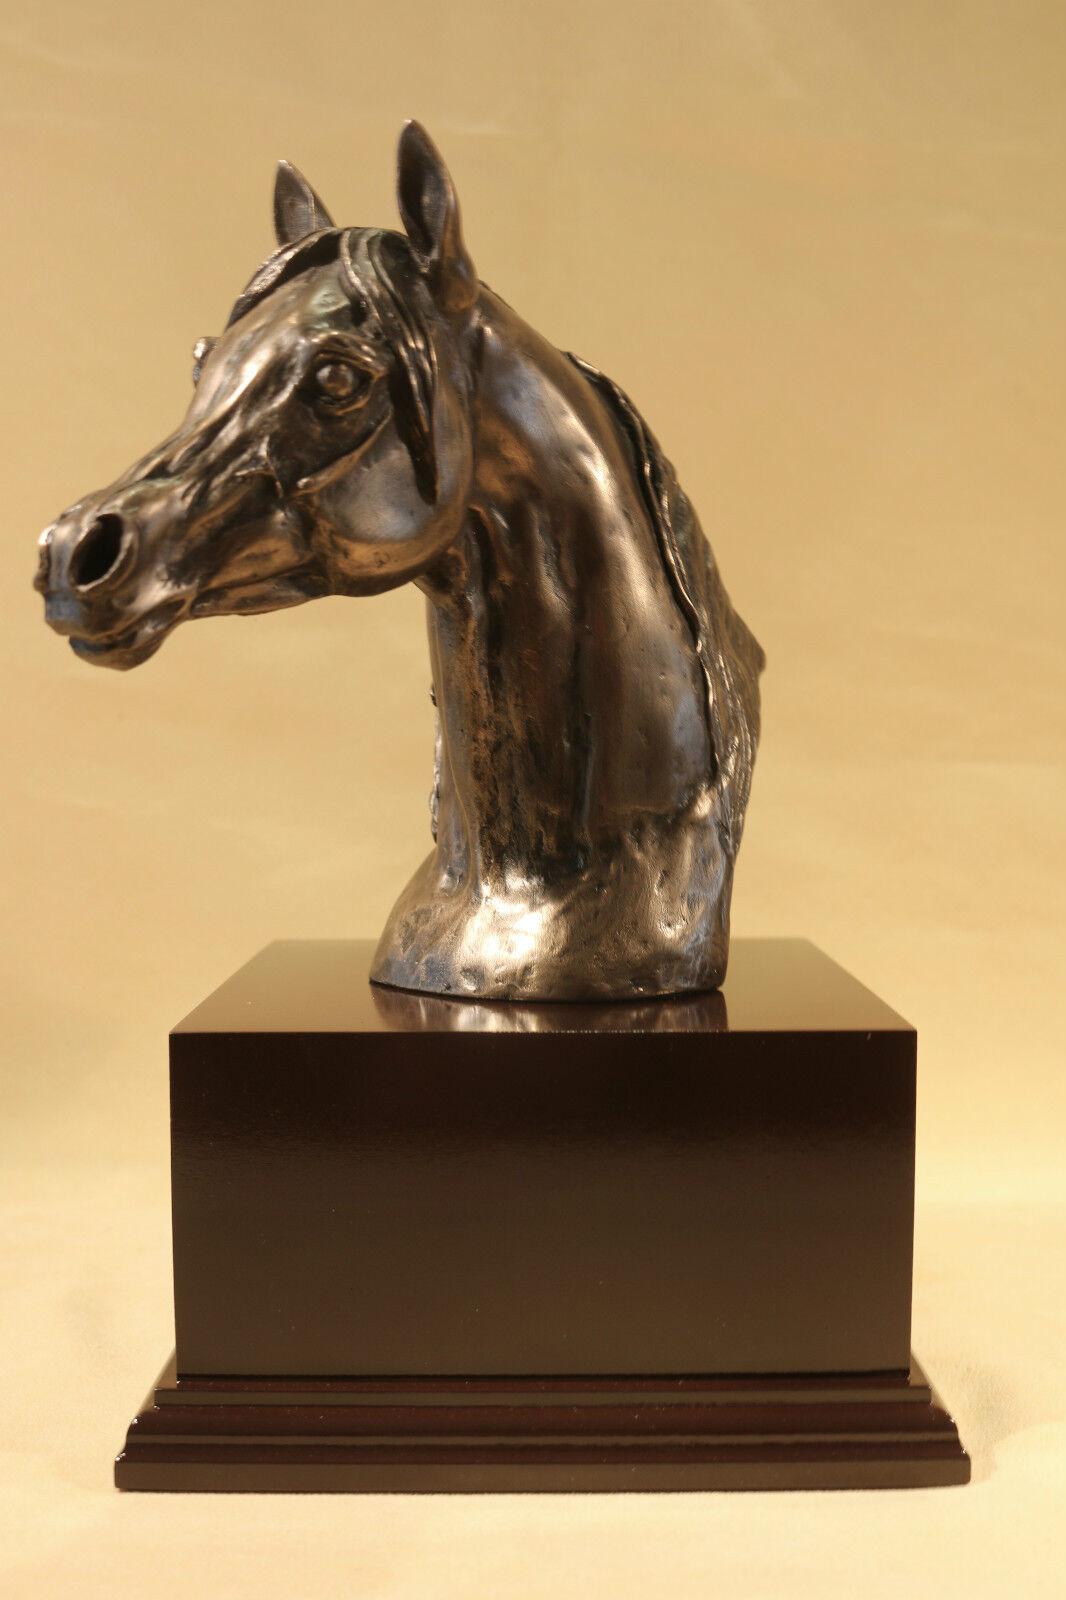 Arab Head - Bronze Trophy - Harriet Glen - Mahogany Plinth